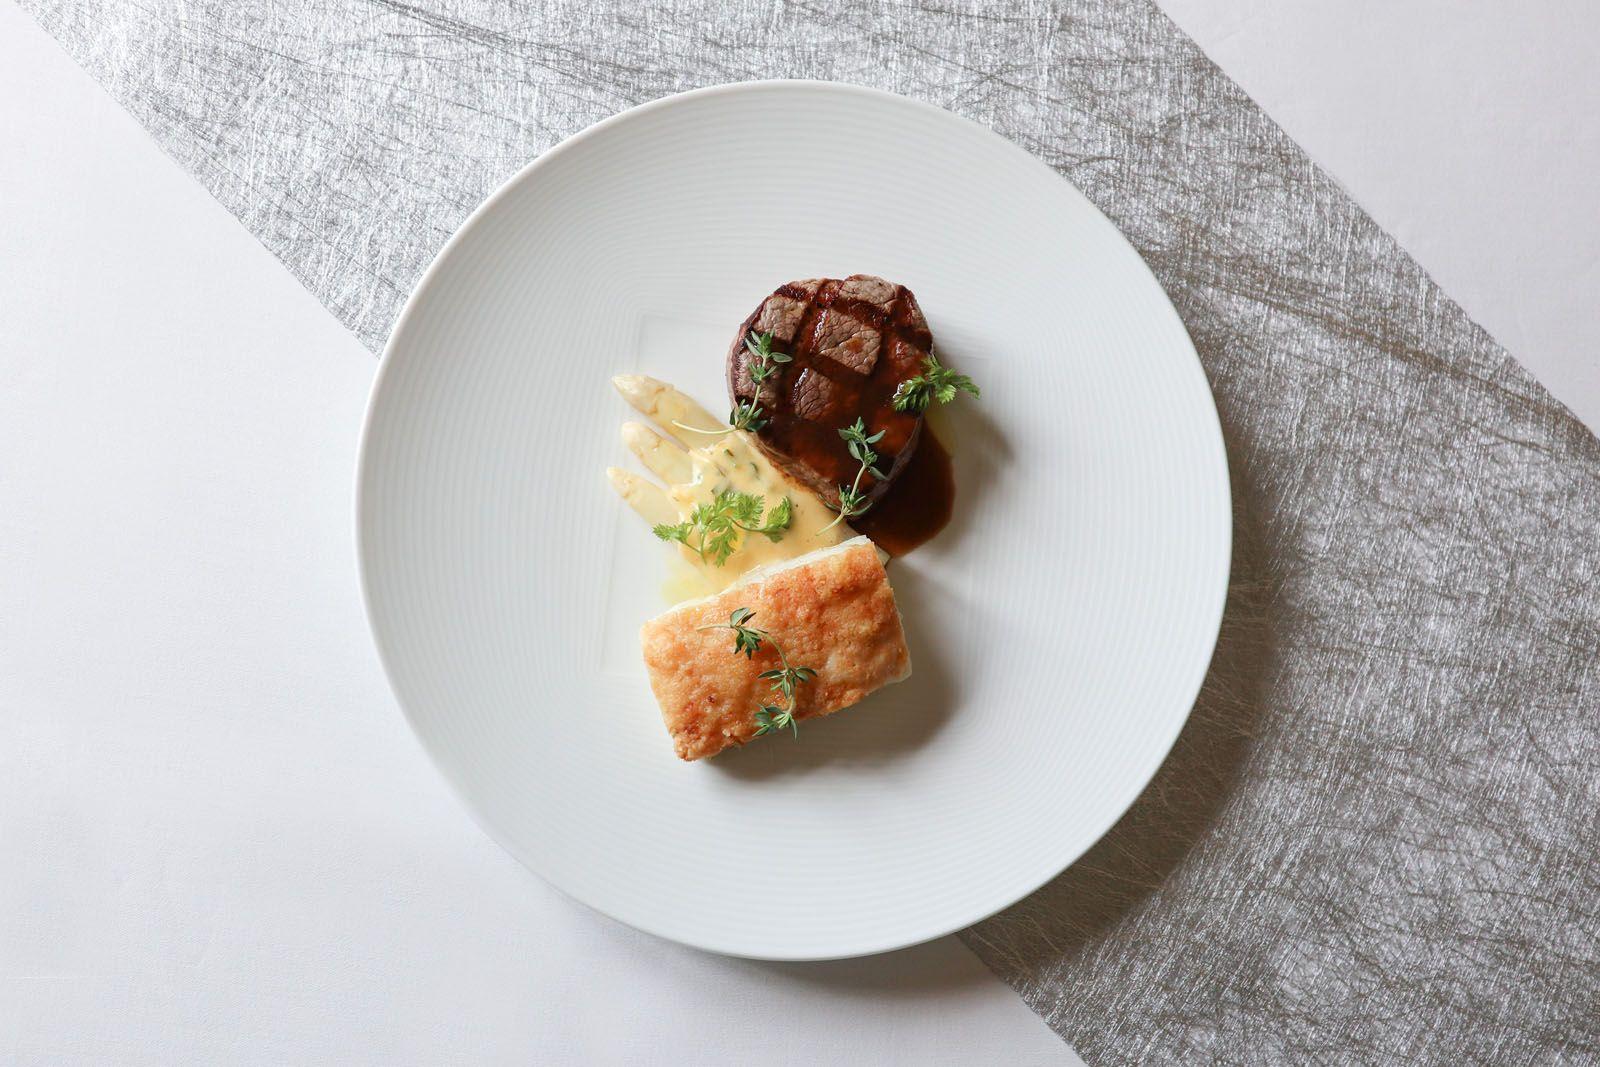 Where to Eat in Singapore This Week: Gordon Grill, Butcher's Block, Skirt, Gazette, Esora